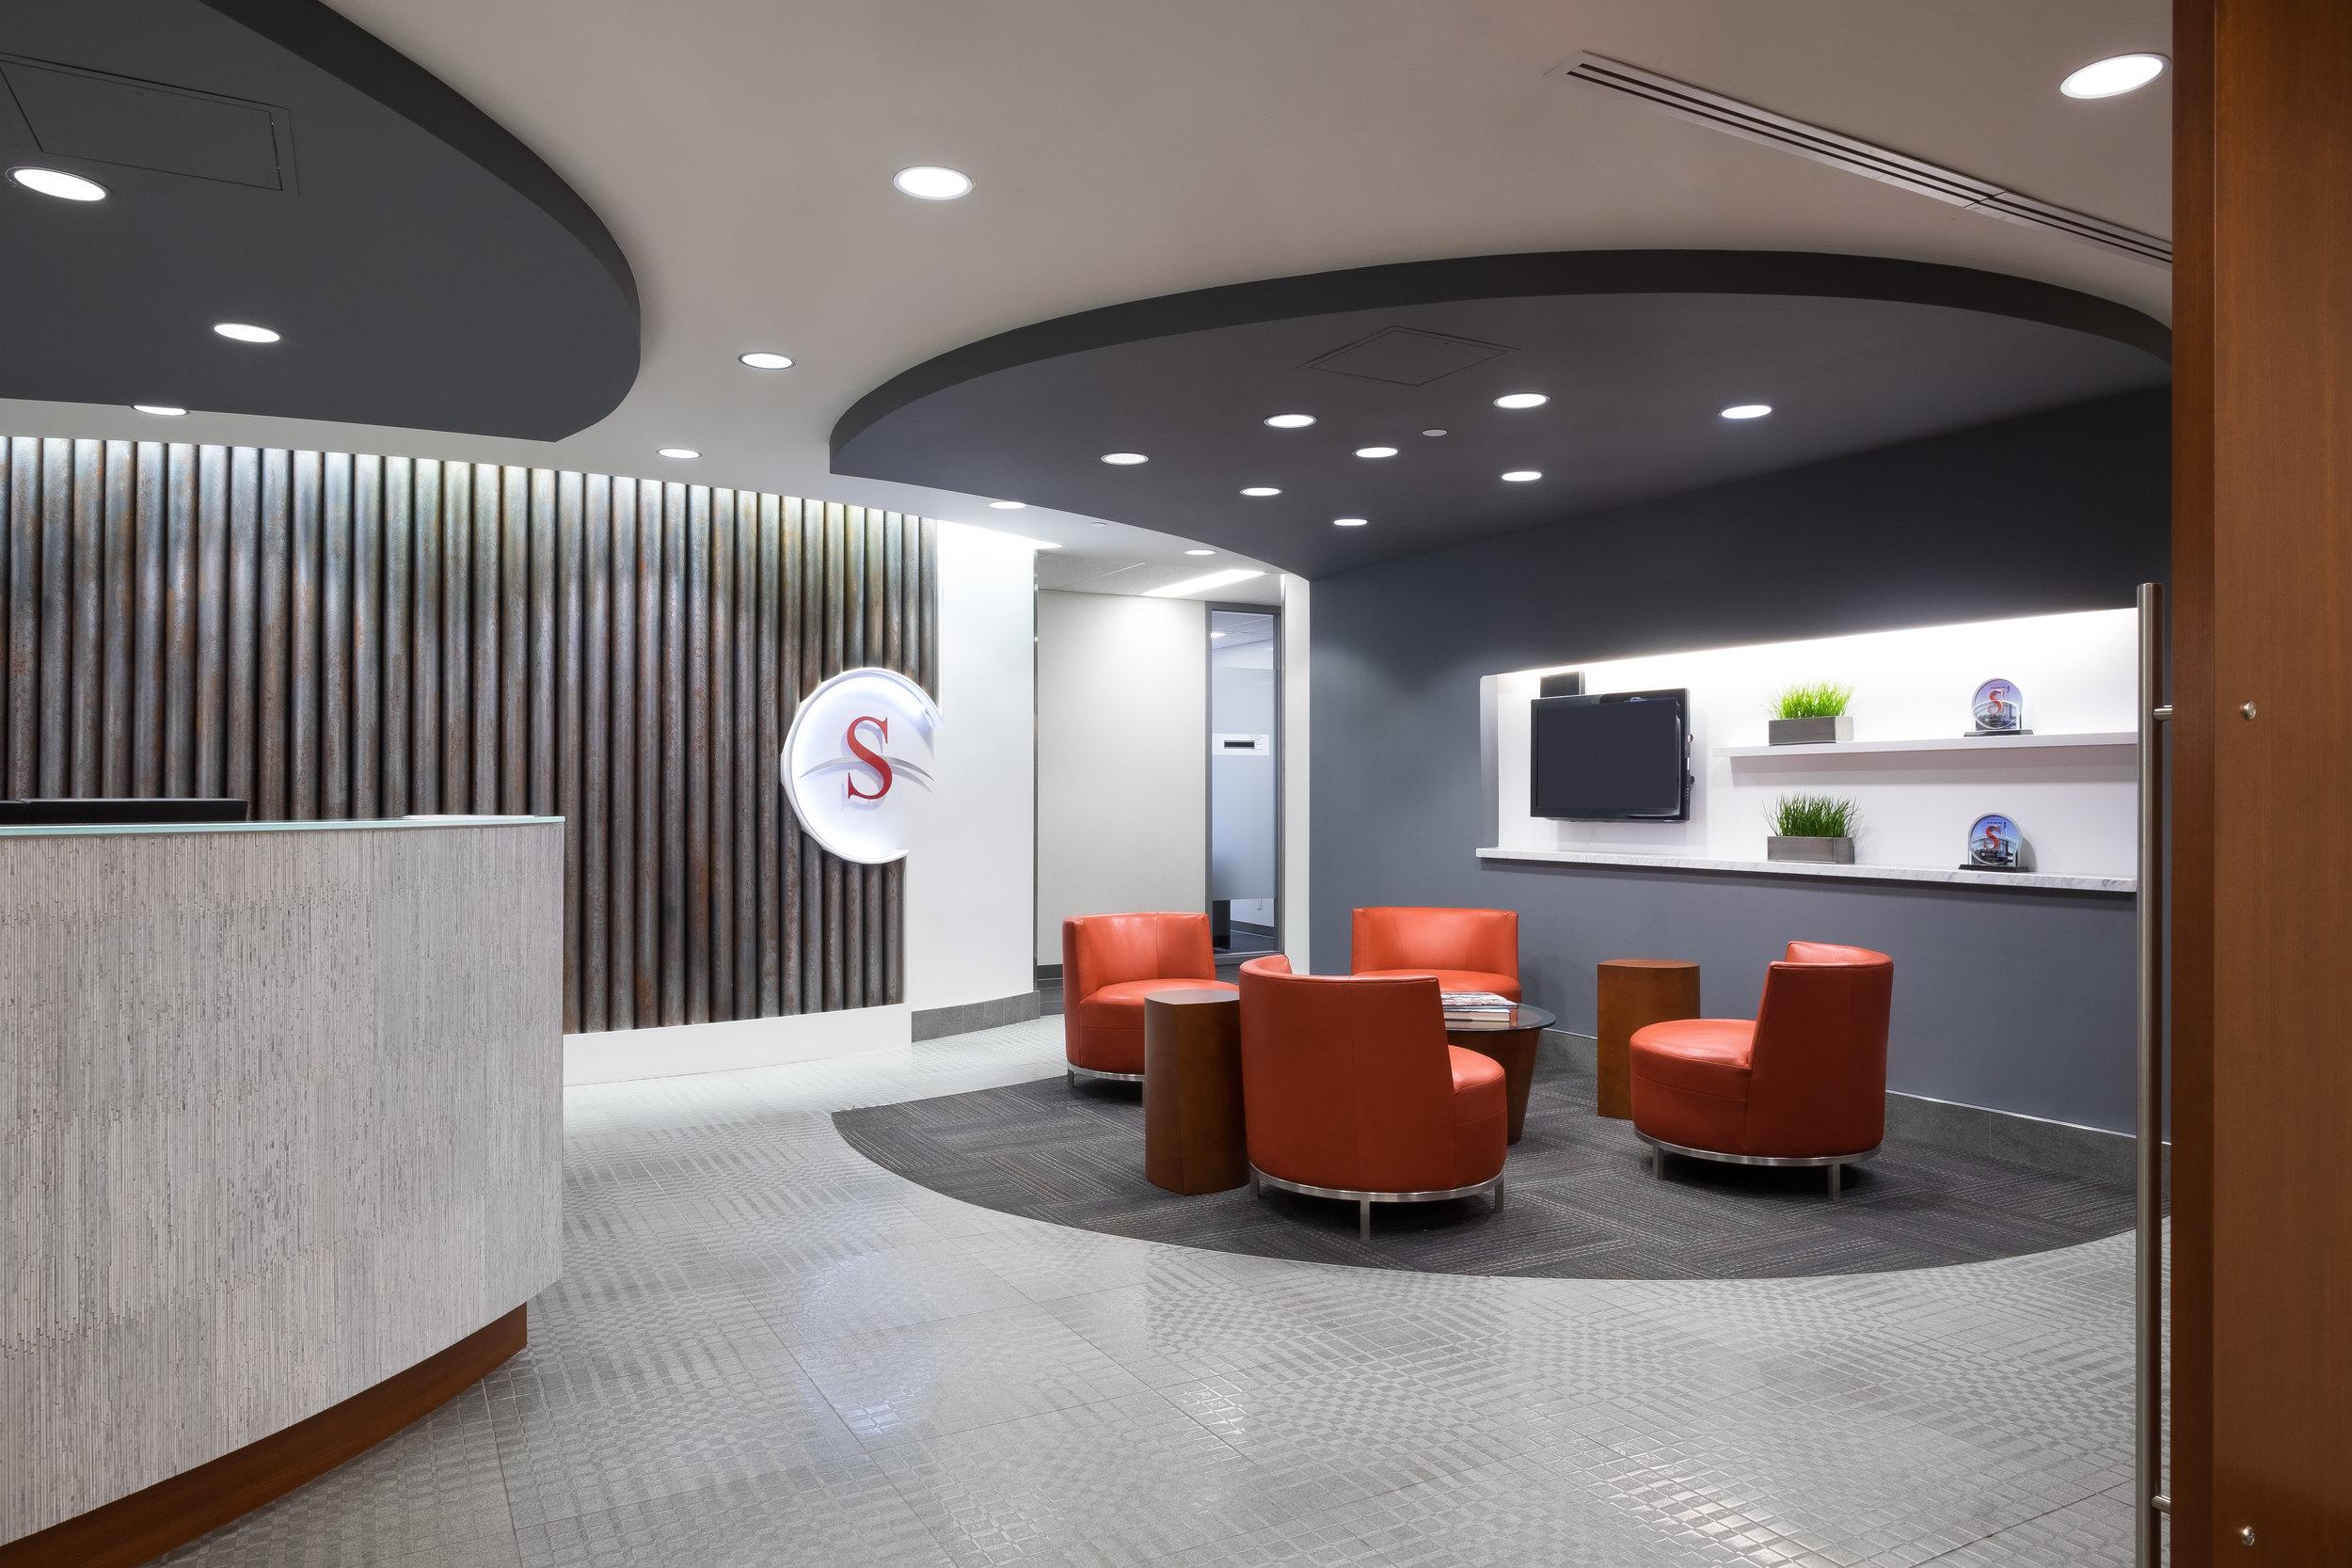 BLOCK-Commercial-Interior-Design-Calgary-Savanna-Energy-Services-Corporation